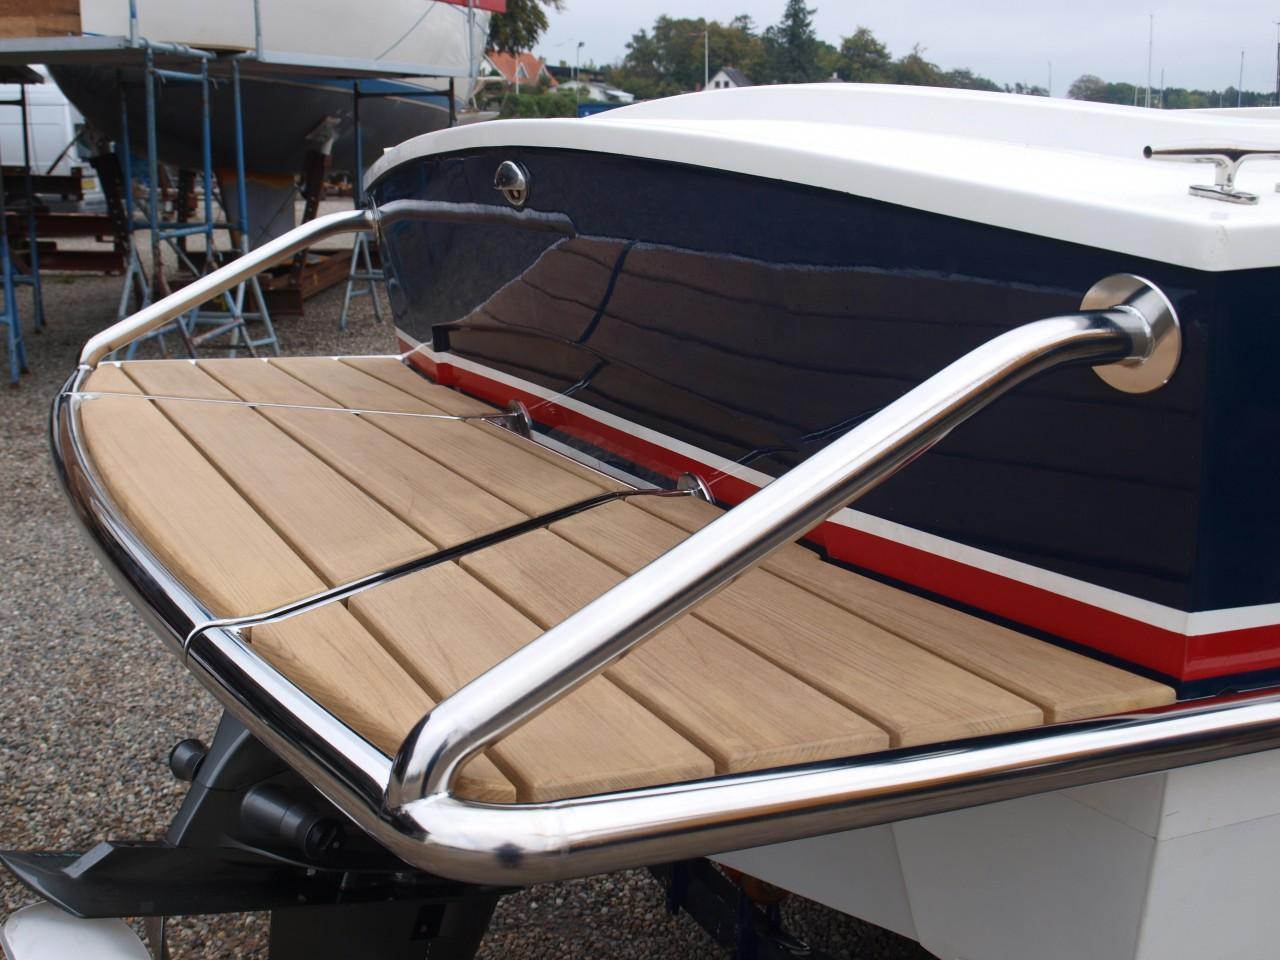 Badeplatform båd